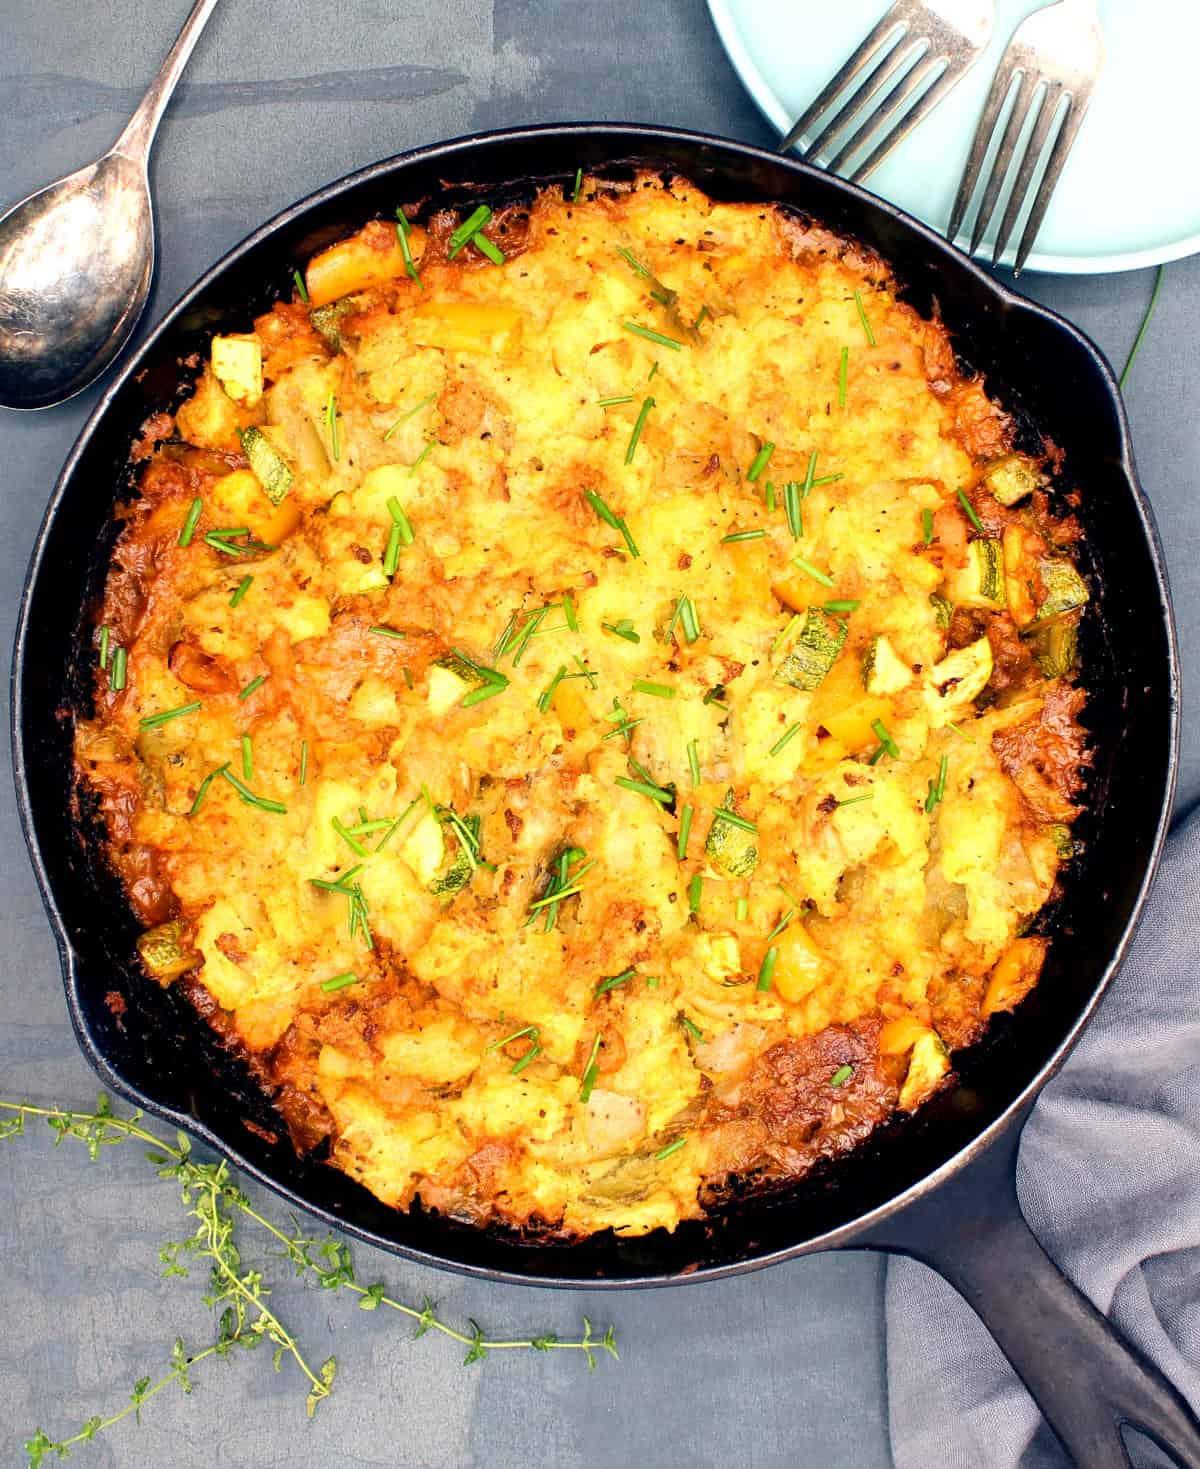 Cheesy vegan dinner bake in cast iron pan